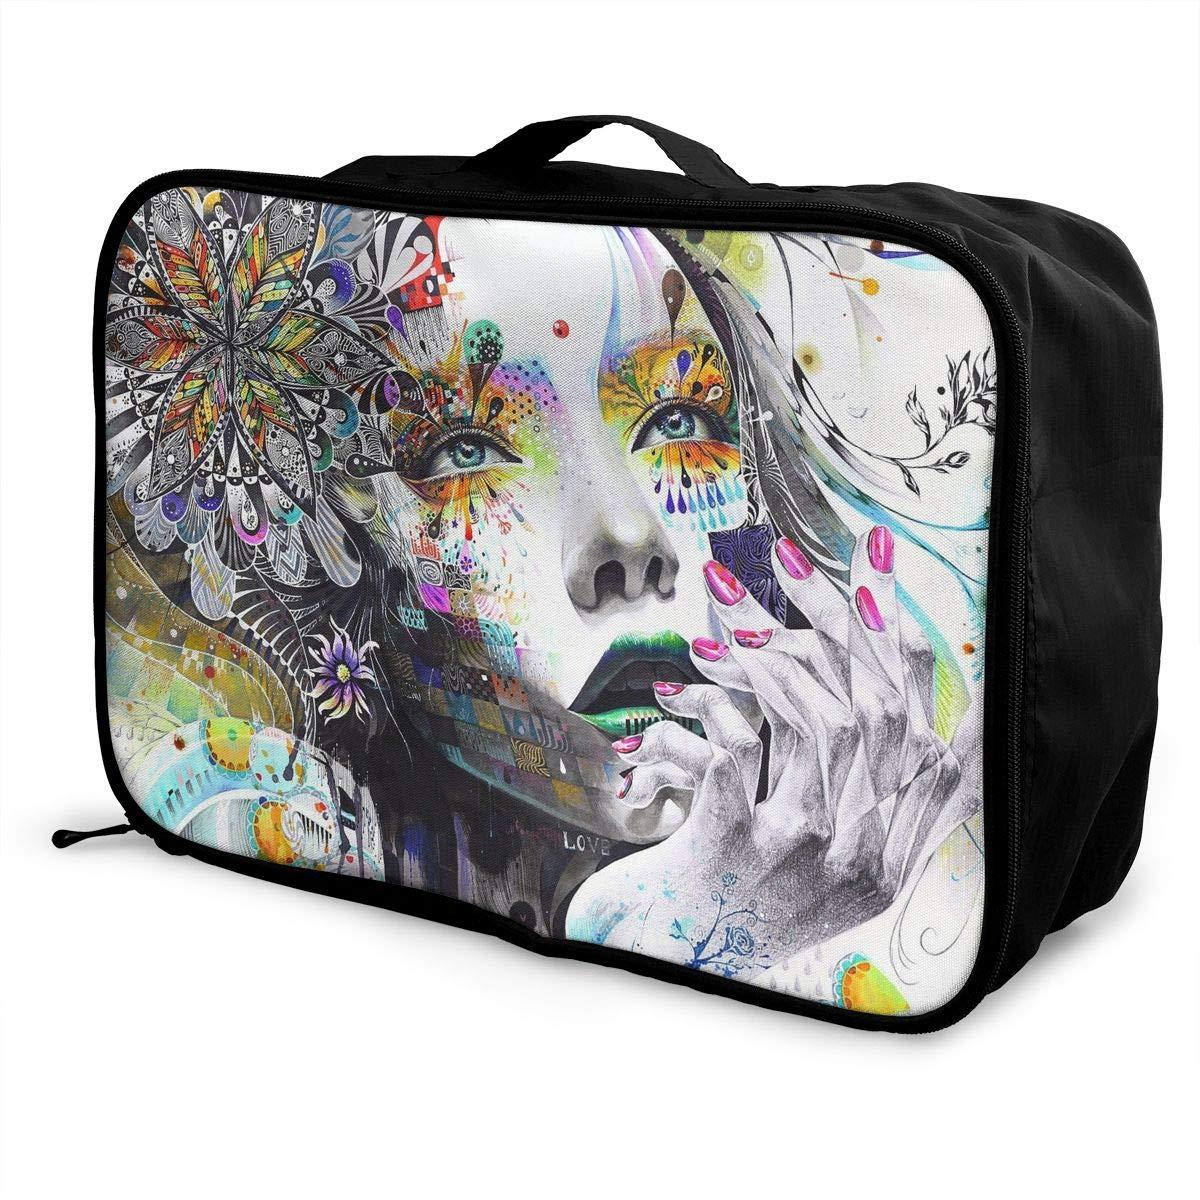 Travel Luggage Duffle Bag Lightweight Portable Handbag Cool Modern Girl Pattern Large Capacity Waterproof Foldable Storage Tote